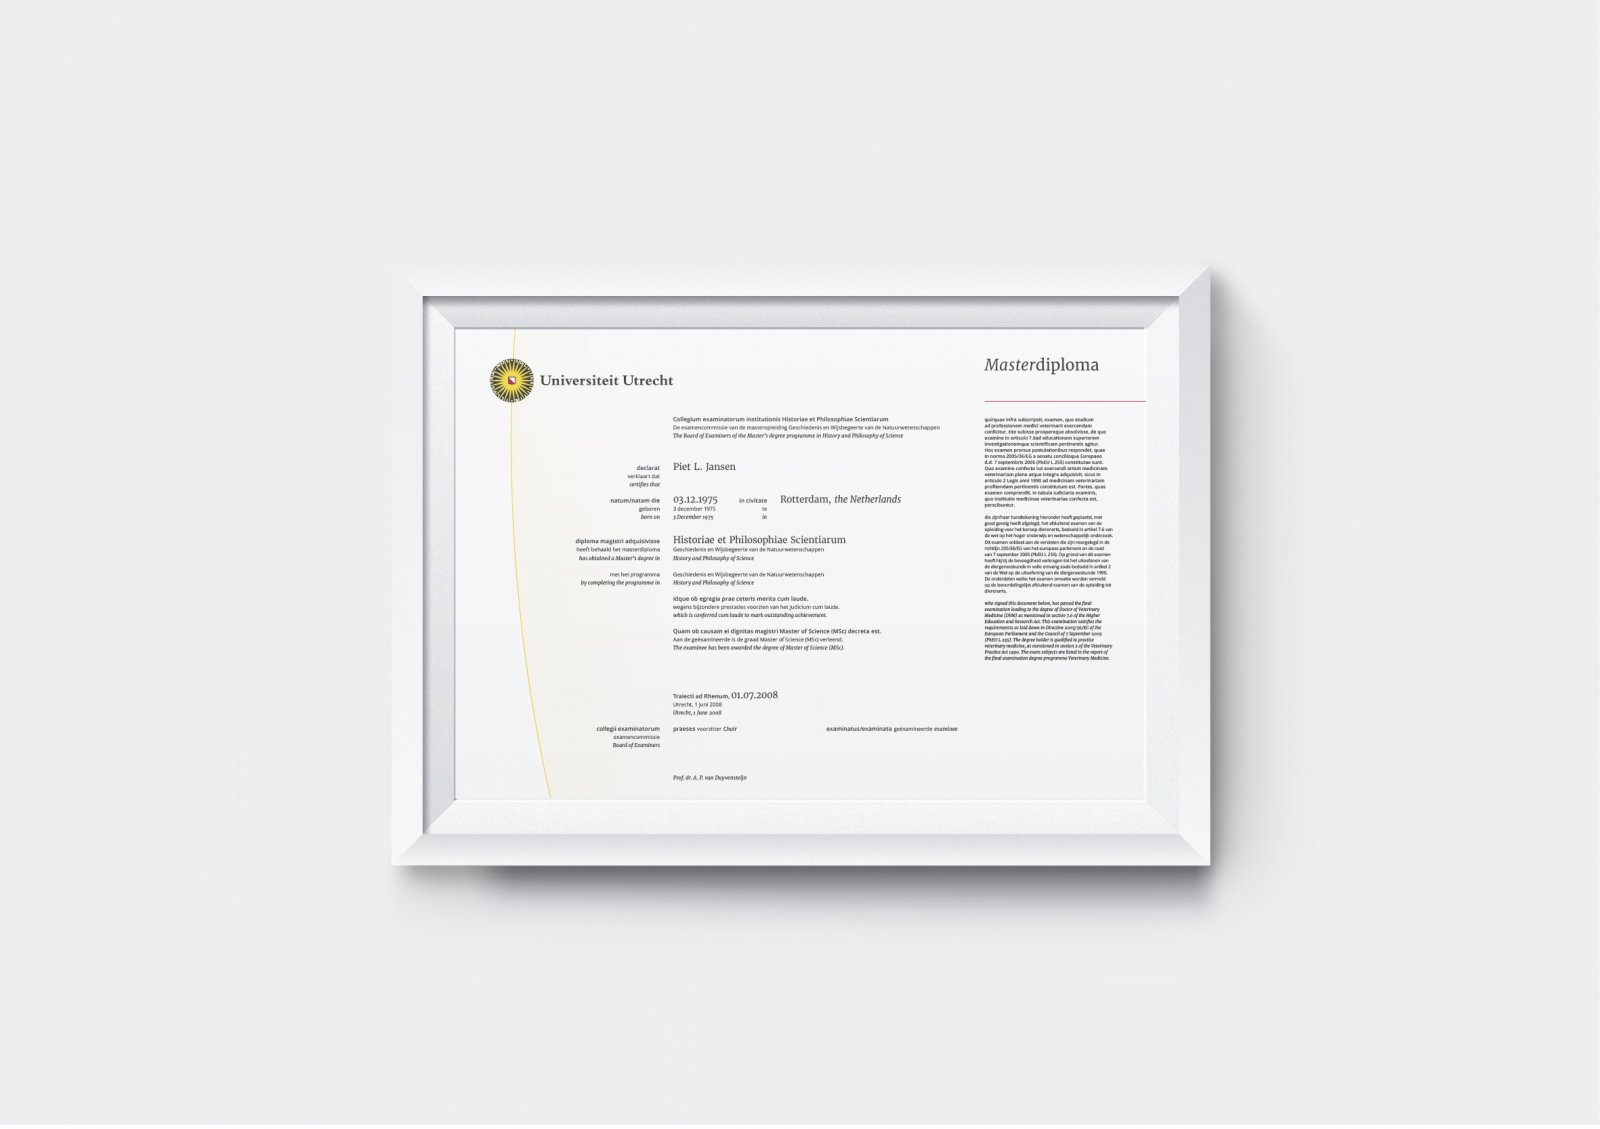 Voorbeeld Master diploma